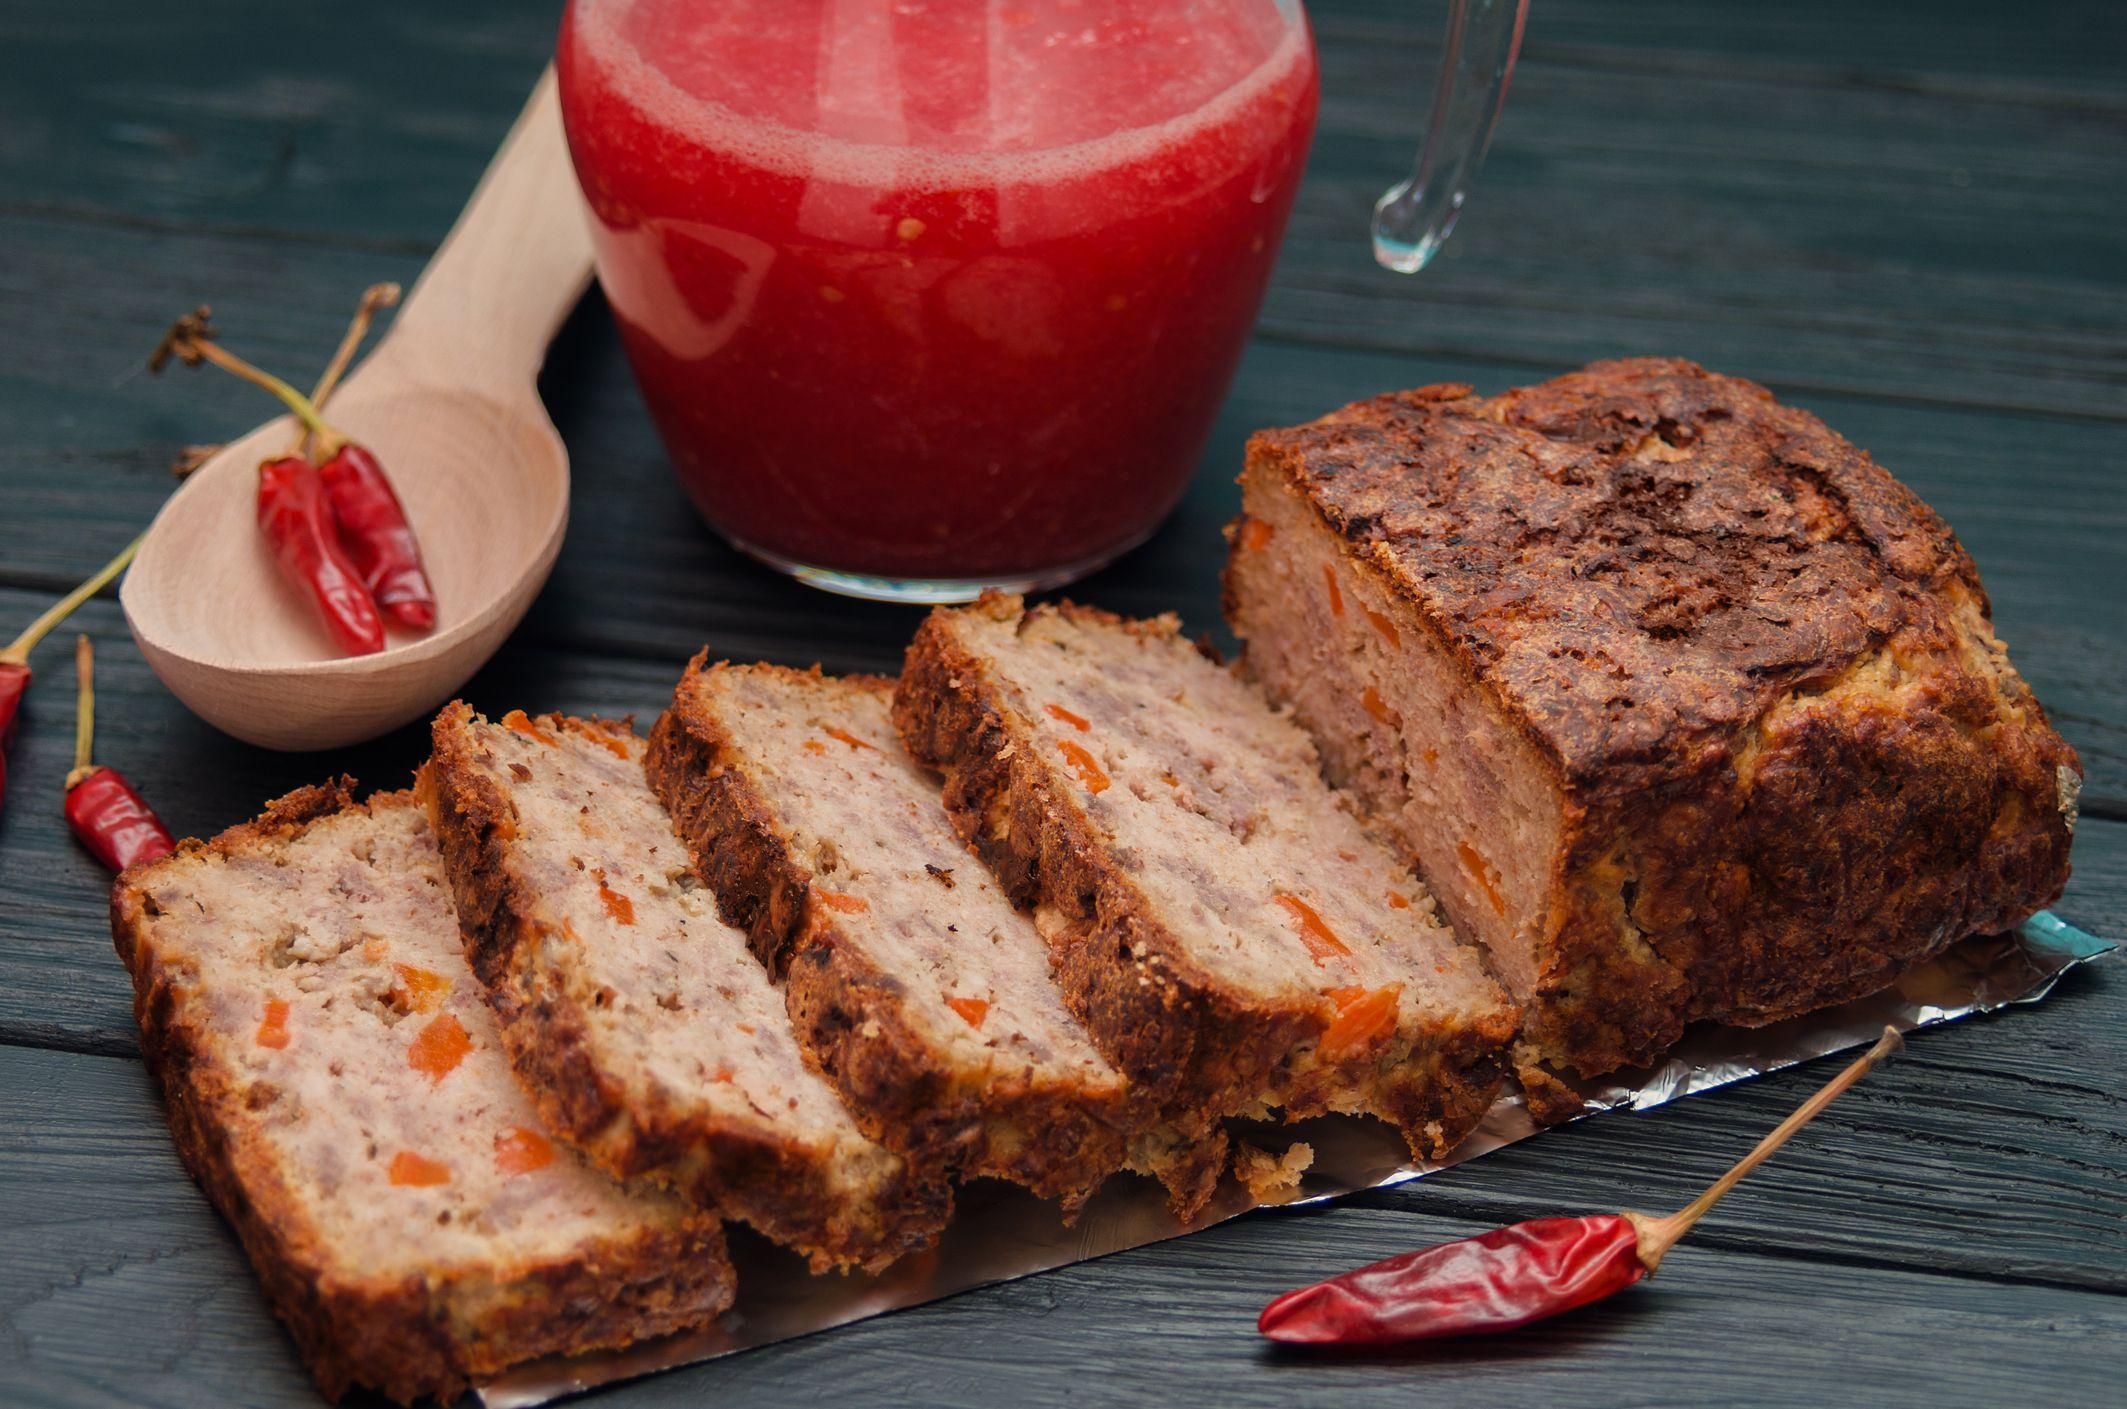 Grandma's Old-Fashioned Meatloaf Recipe